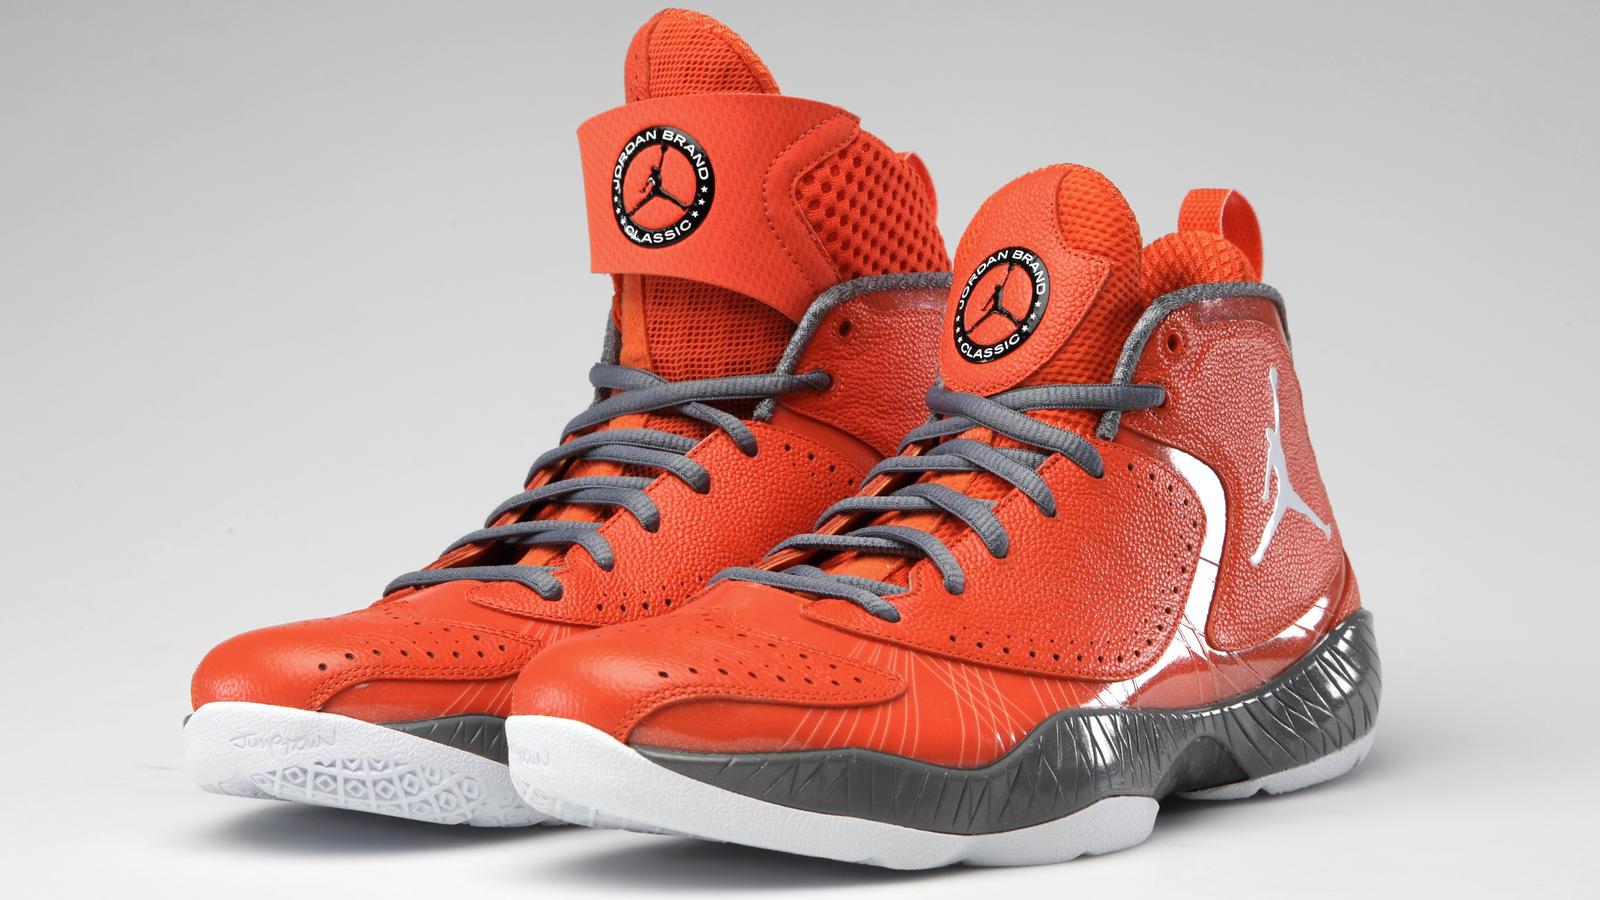 Jordan Brand Classic Air Jordan 2012